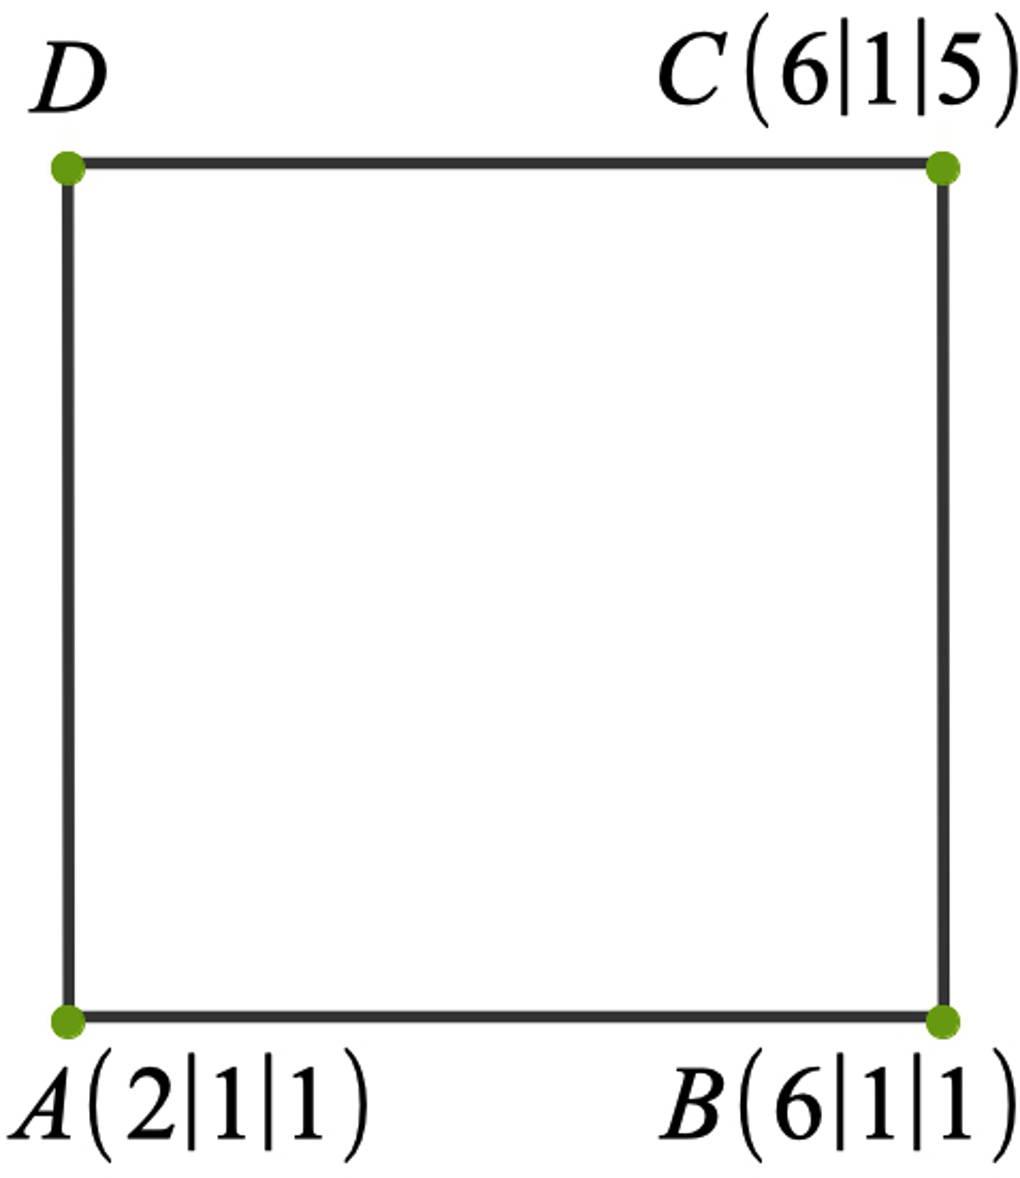 1159_Quadrat.jpg